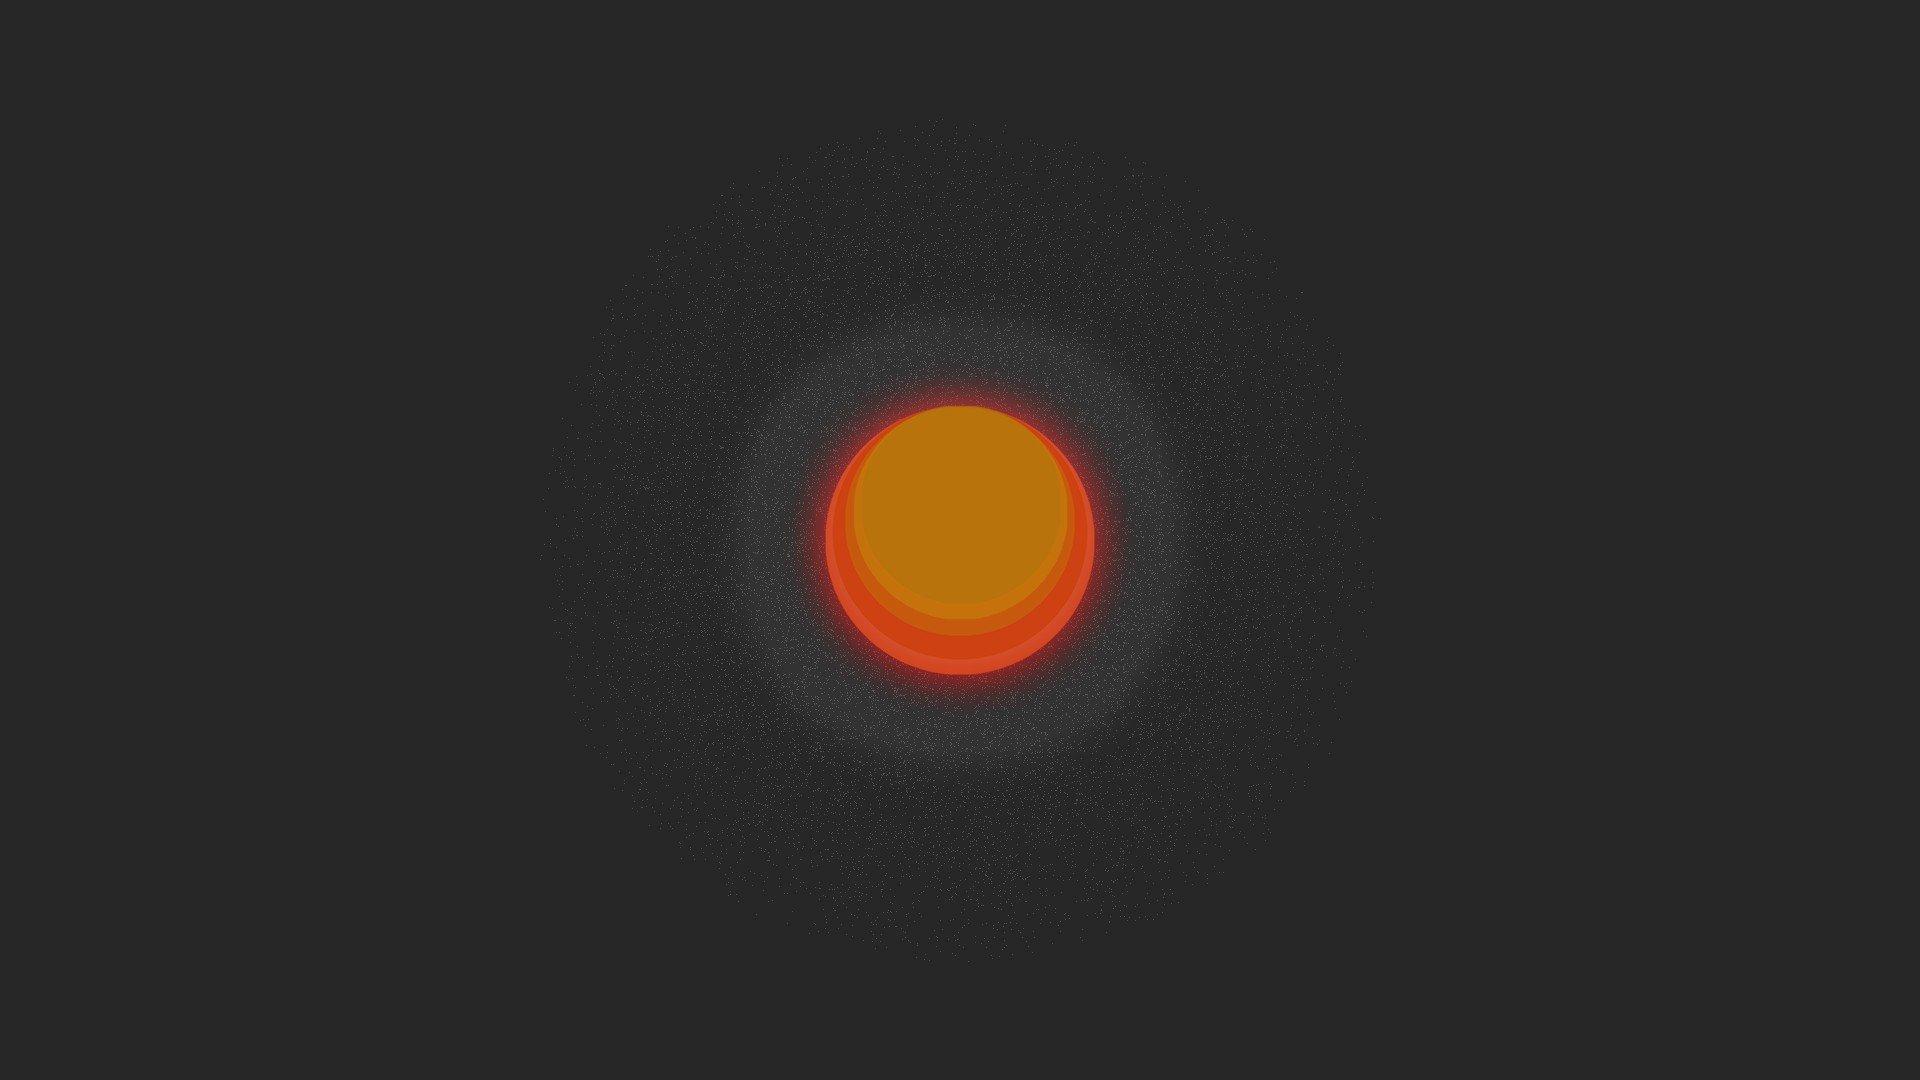 Sun Orange Red Simple Minimalism Simple Background Space Art